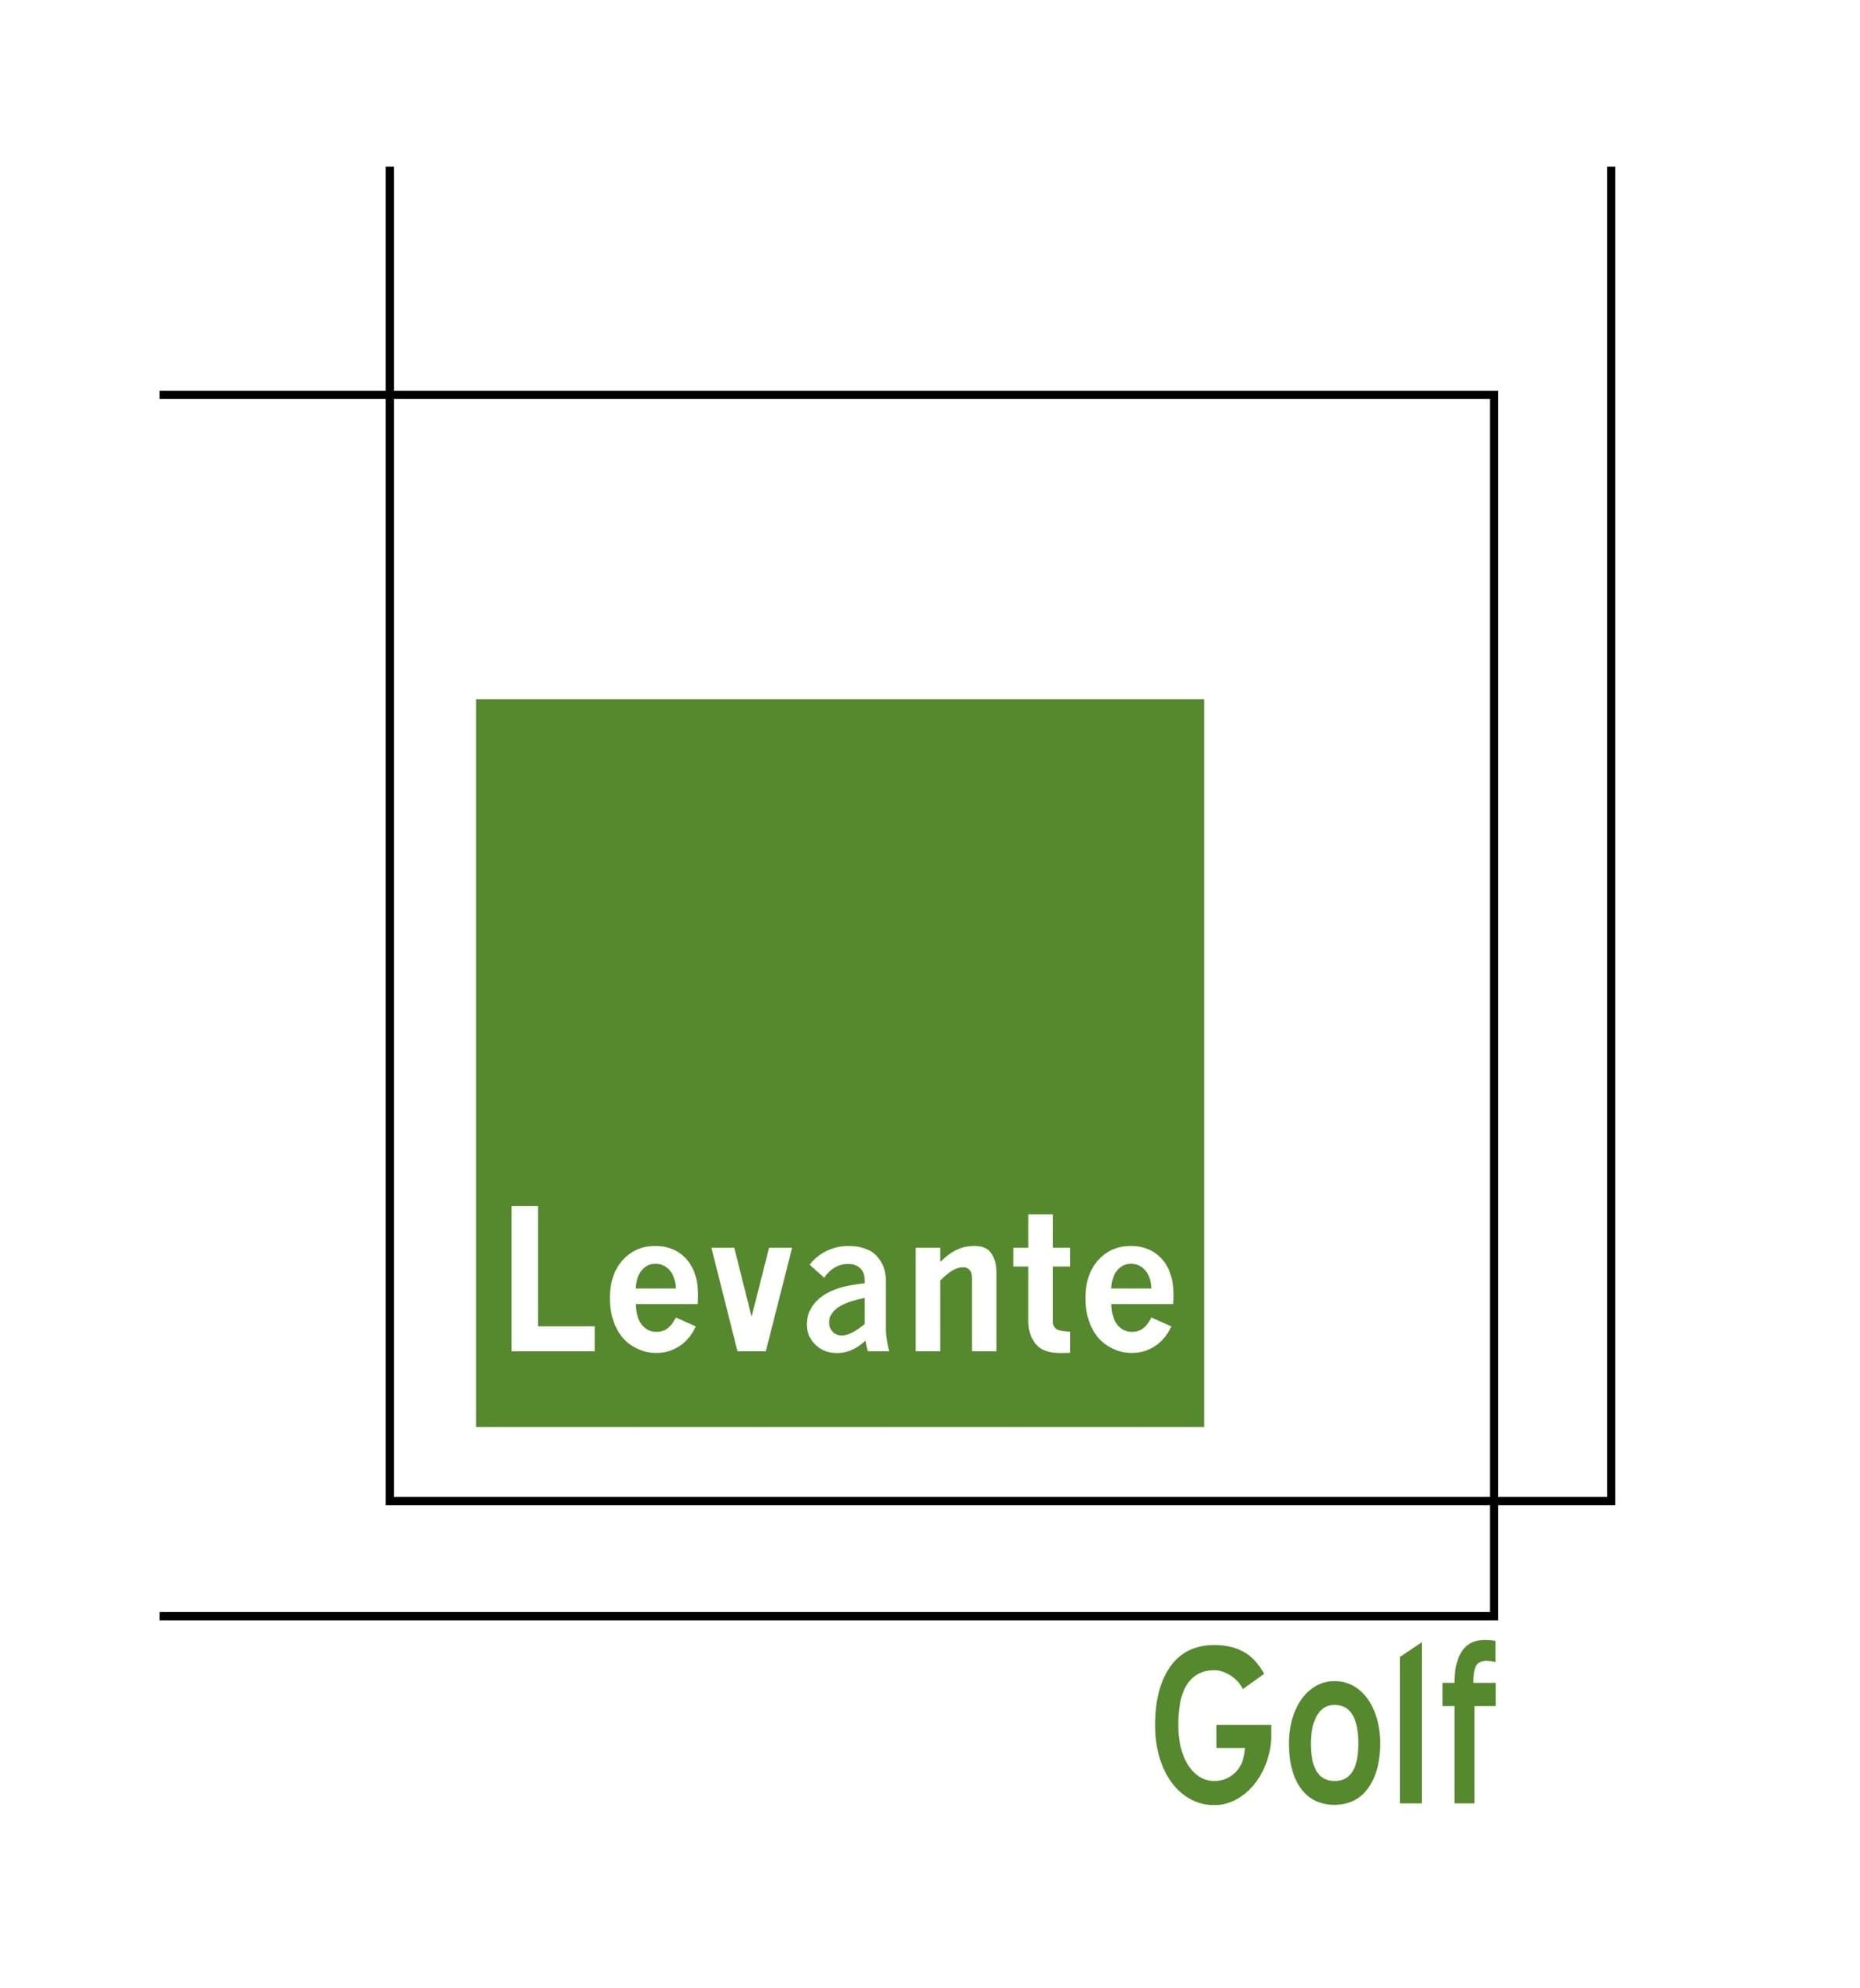 Levante Golf